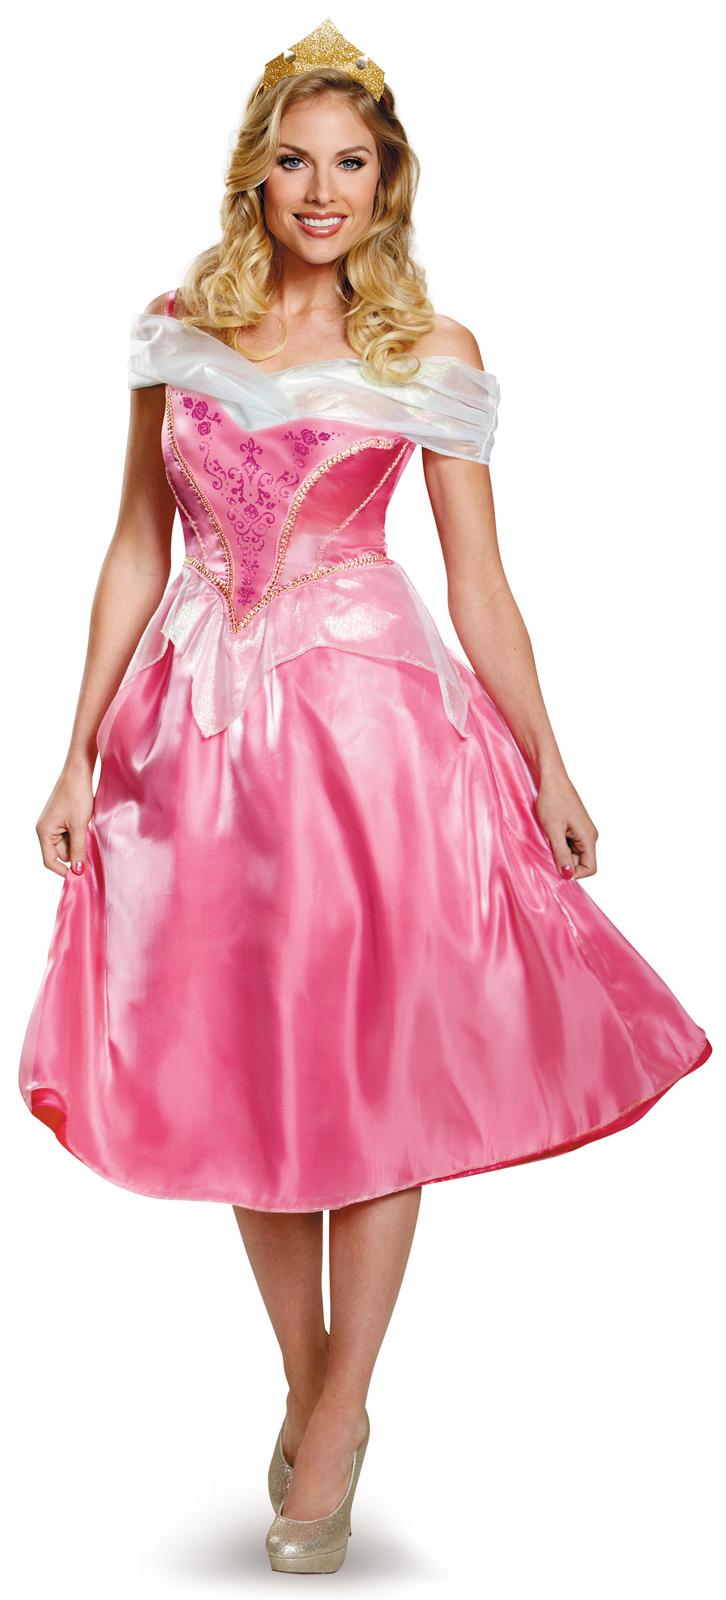 Women's Disney Princess Aurora Deluxe Adult Costume - Pink - Large (12-14) BS-243664